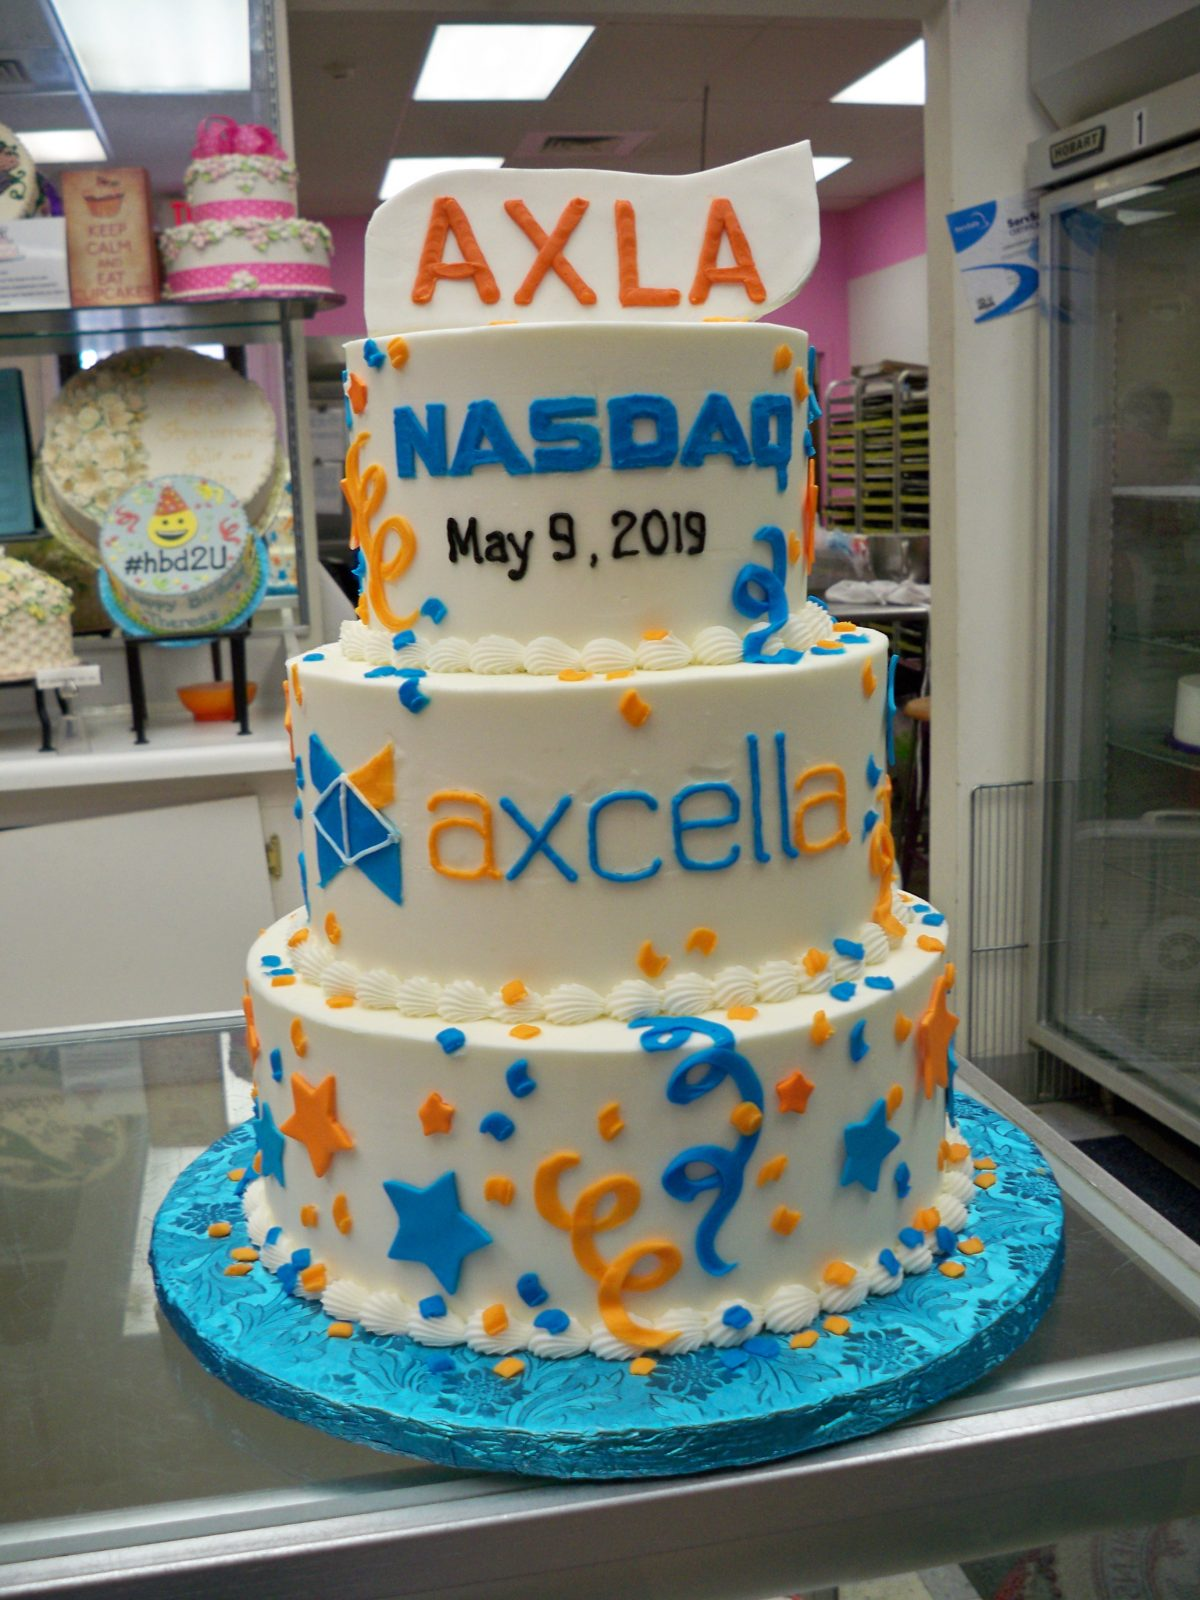 Corporate cake, company anniversary, nasdaq listing cake